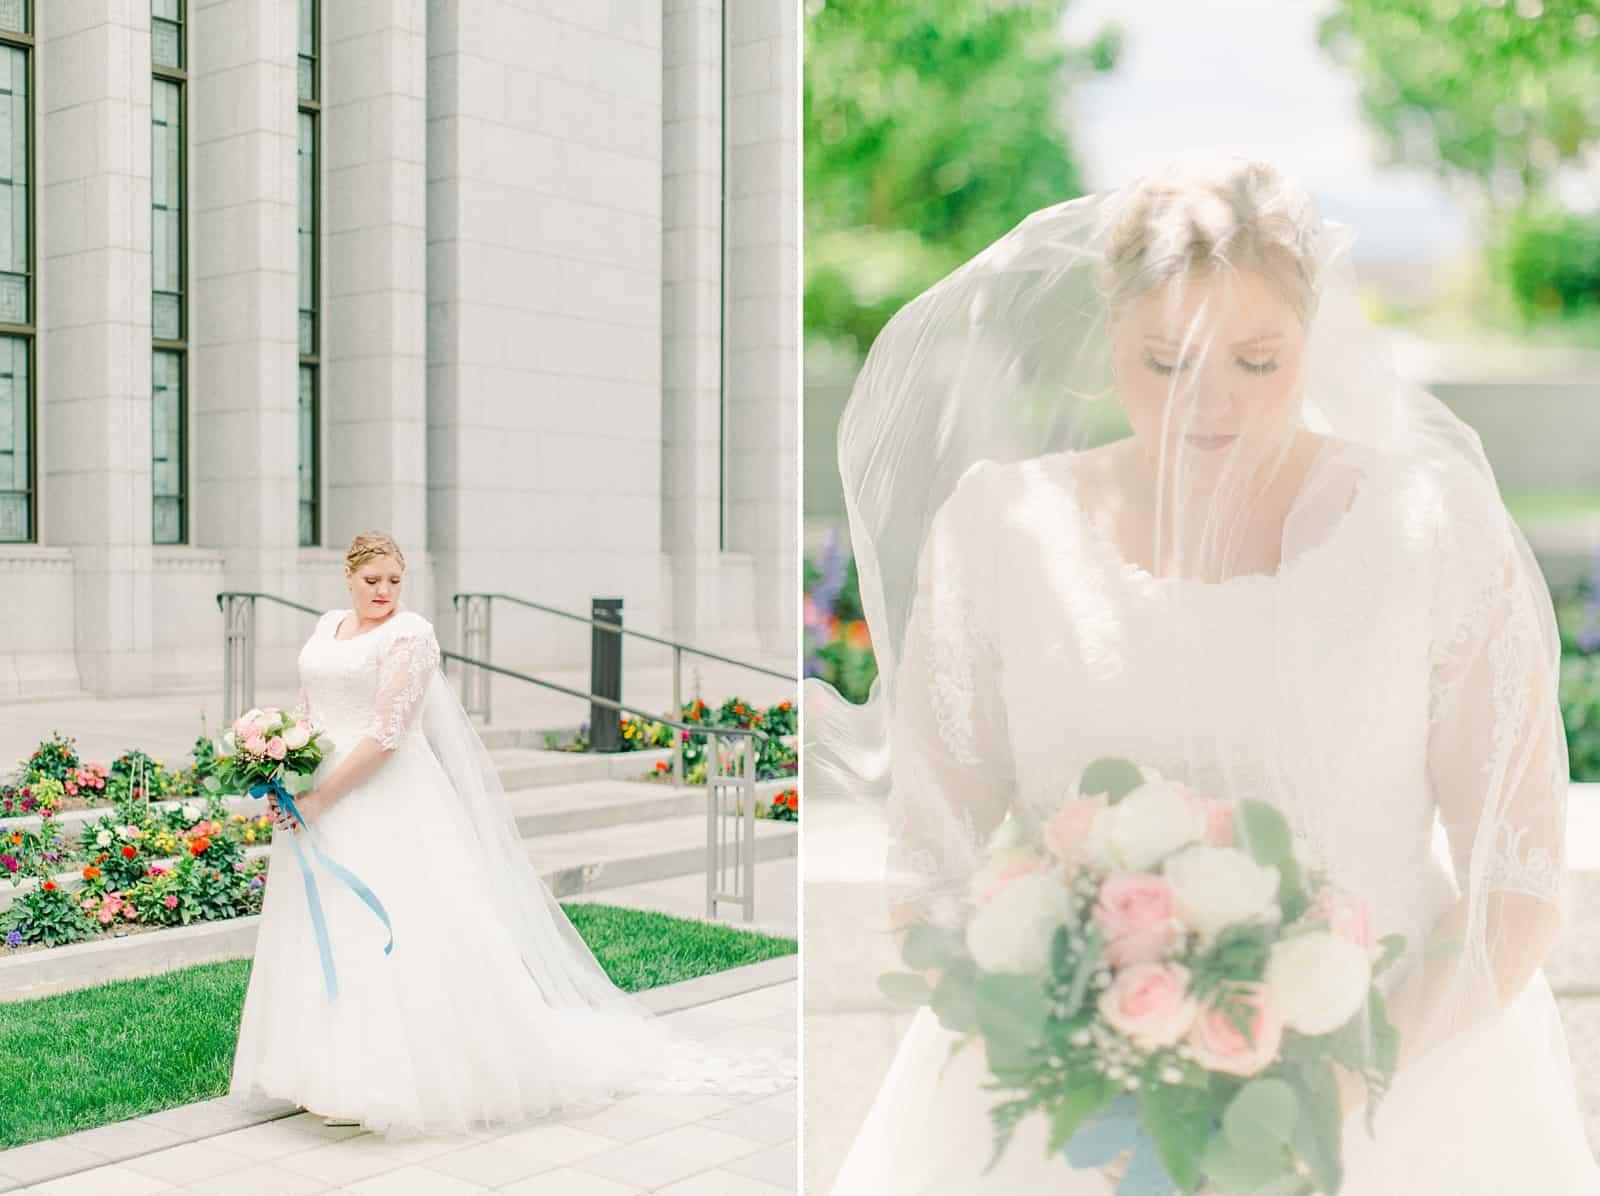 Draper LDS Temple Wedding, Utah wedding photography, summer backyard wedding, modest lace wedding dress with long train and veil